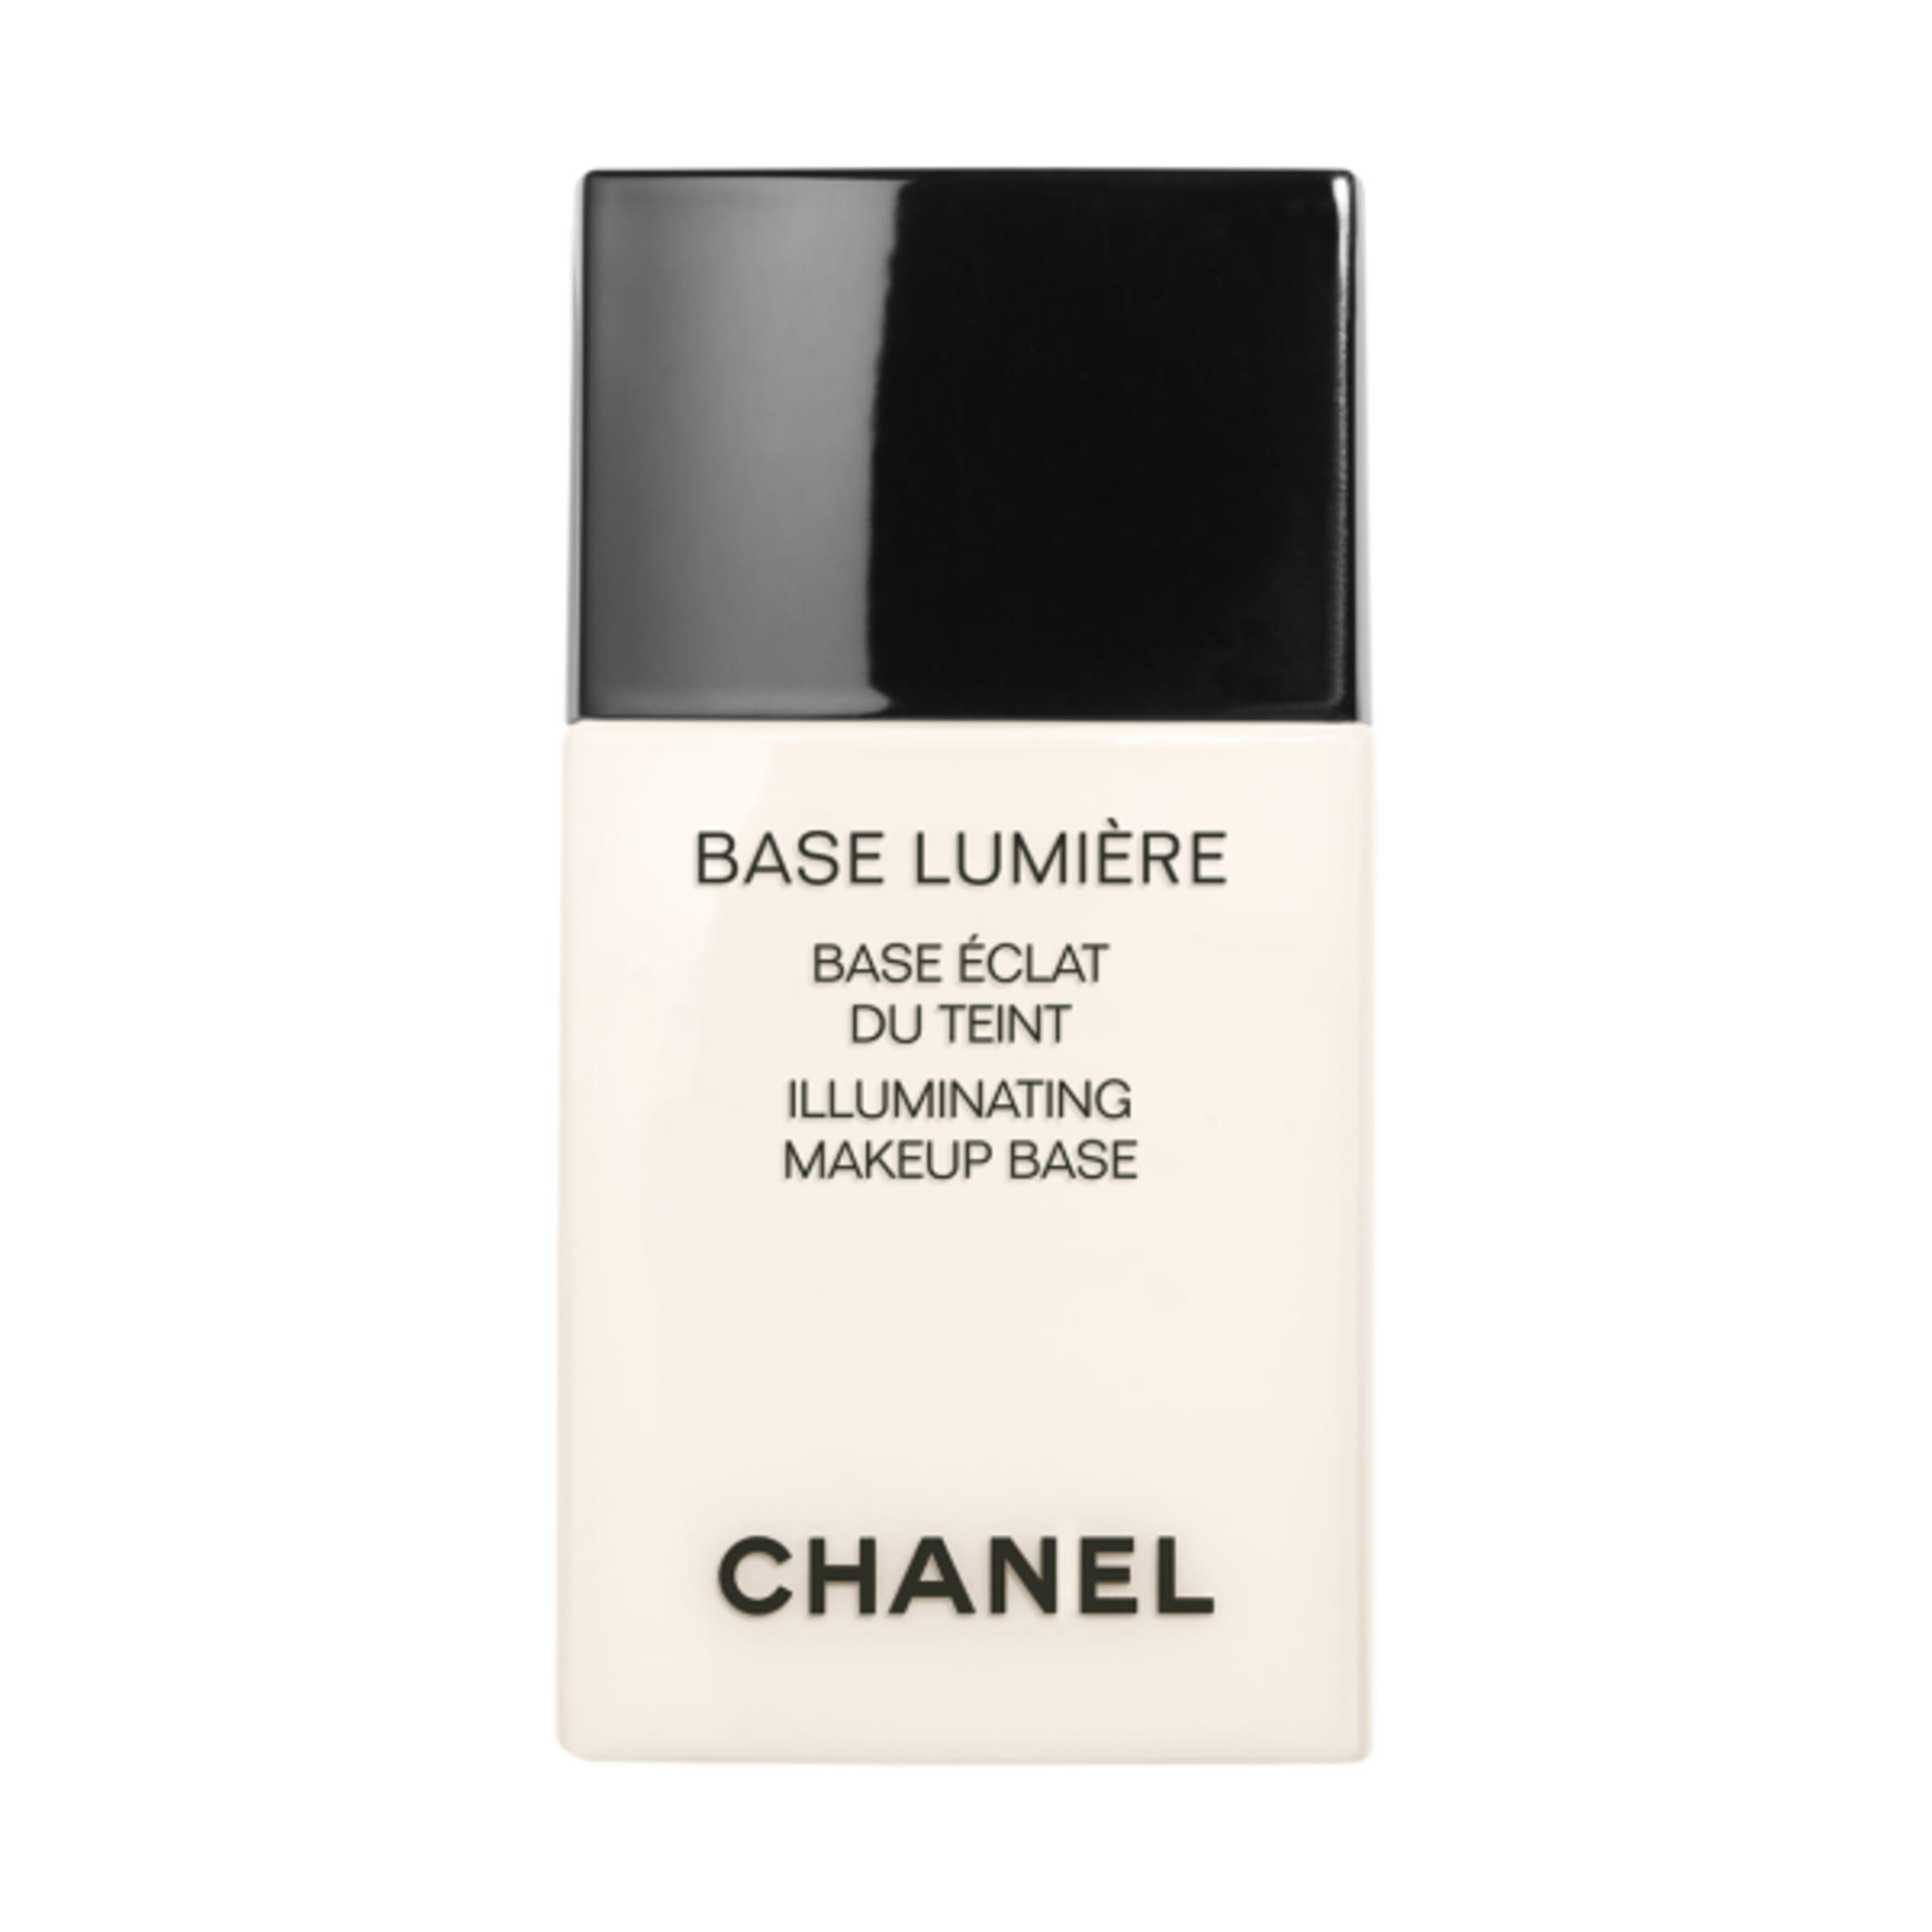 Illuminating Makeup Base Chanel